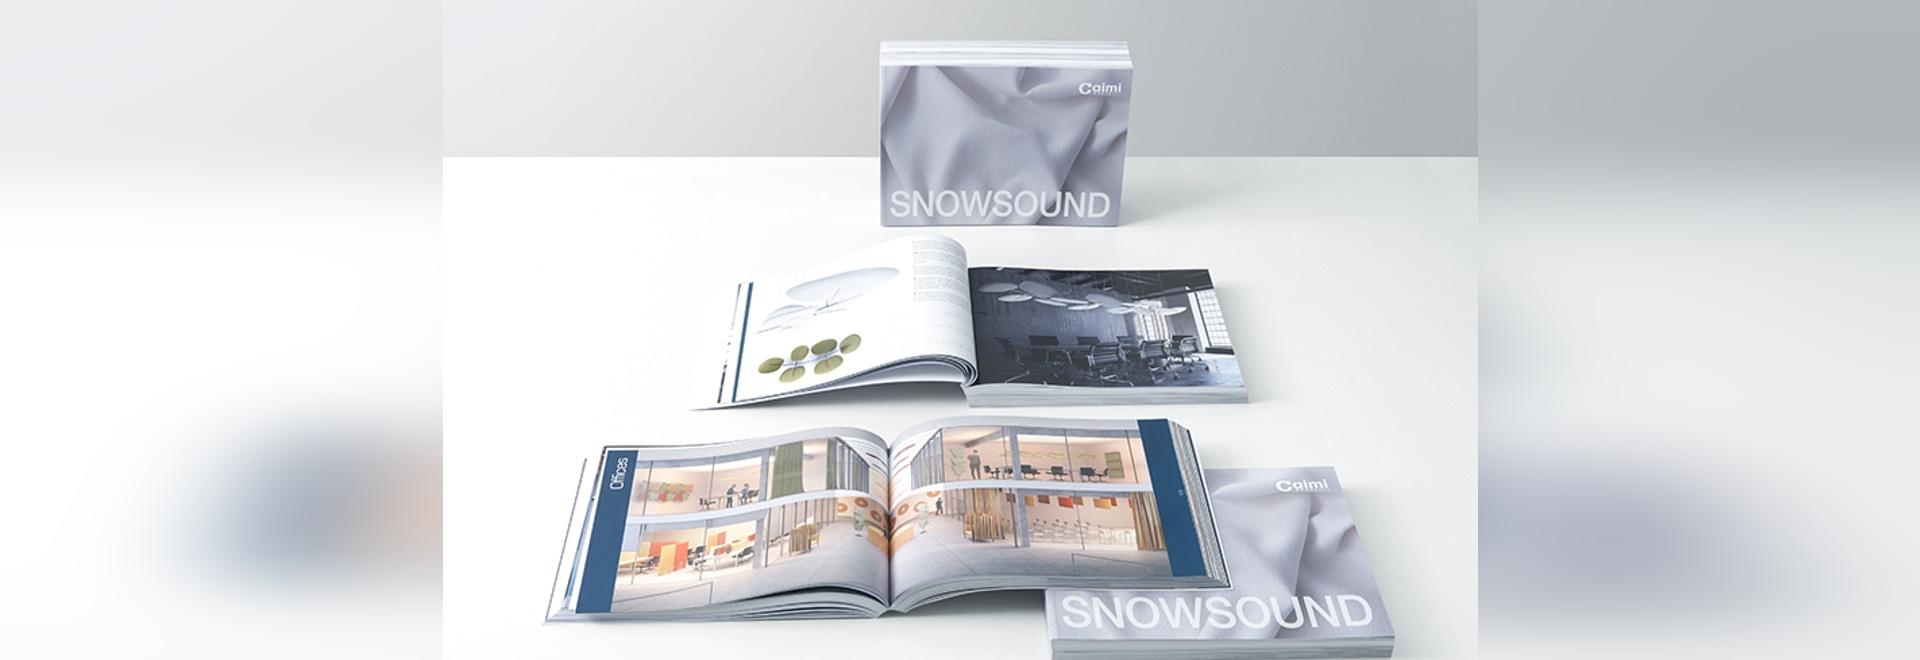 Snowsound catalogue